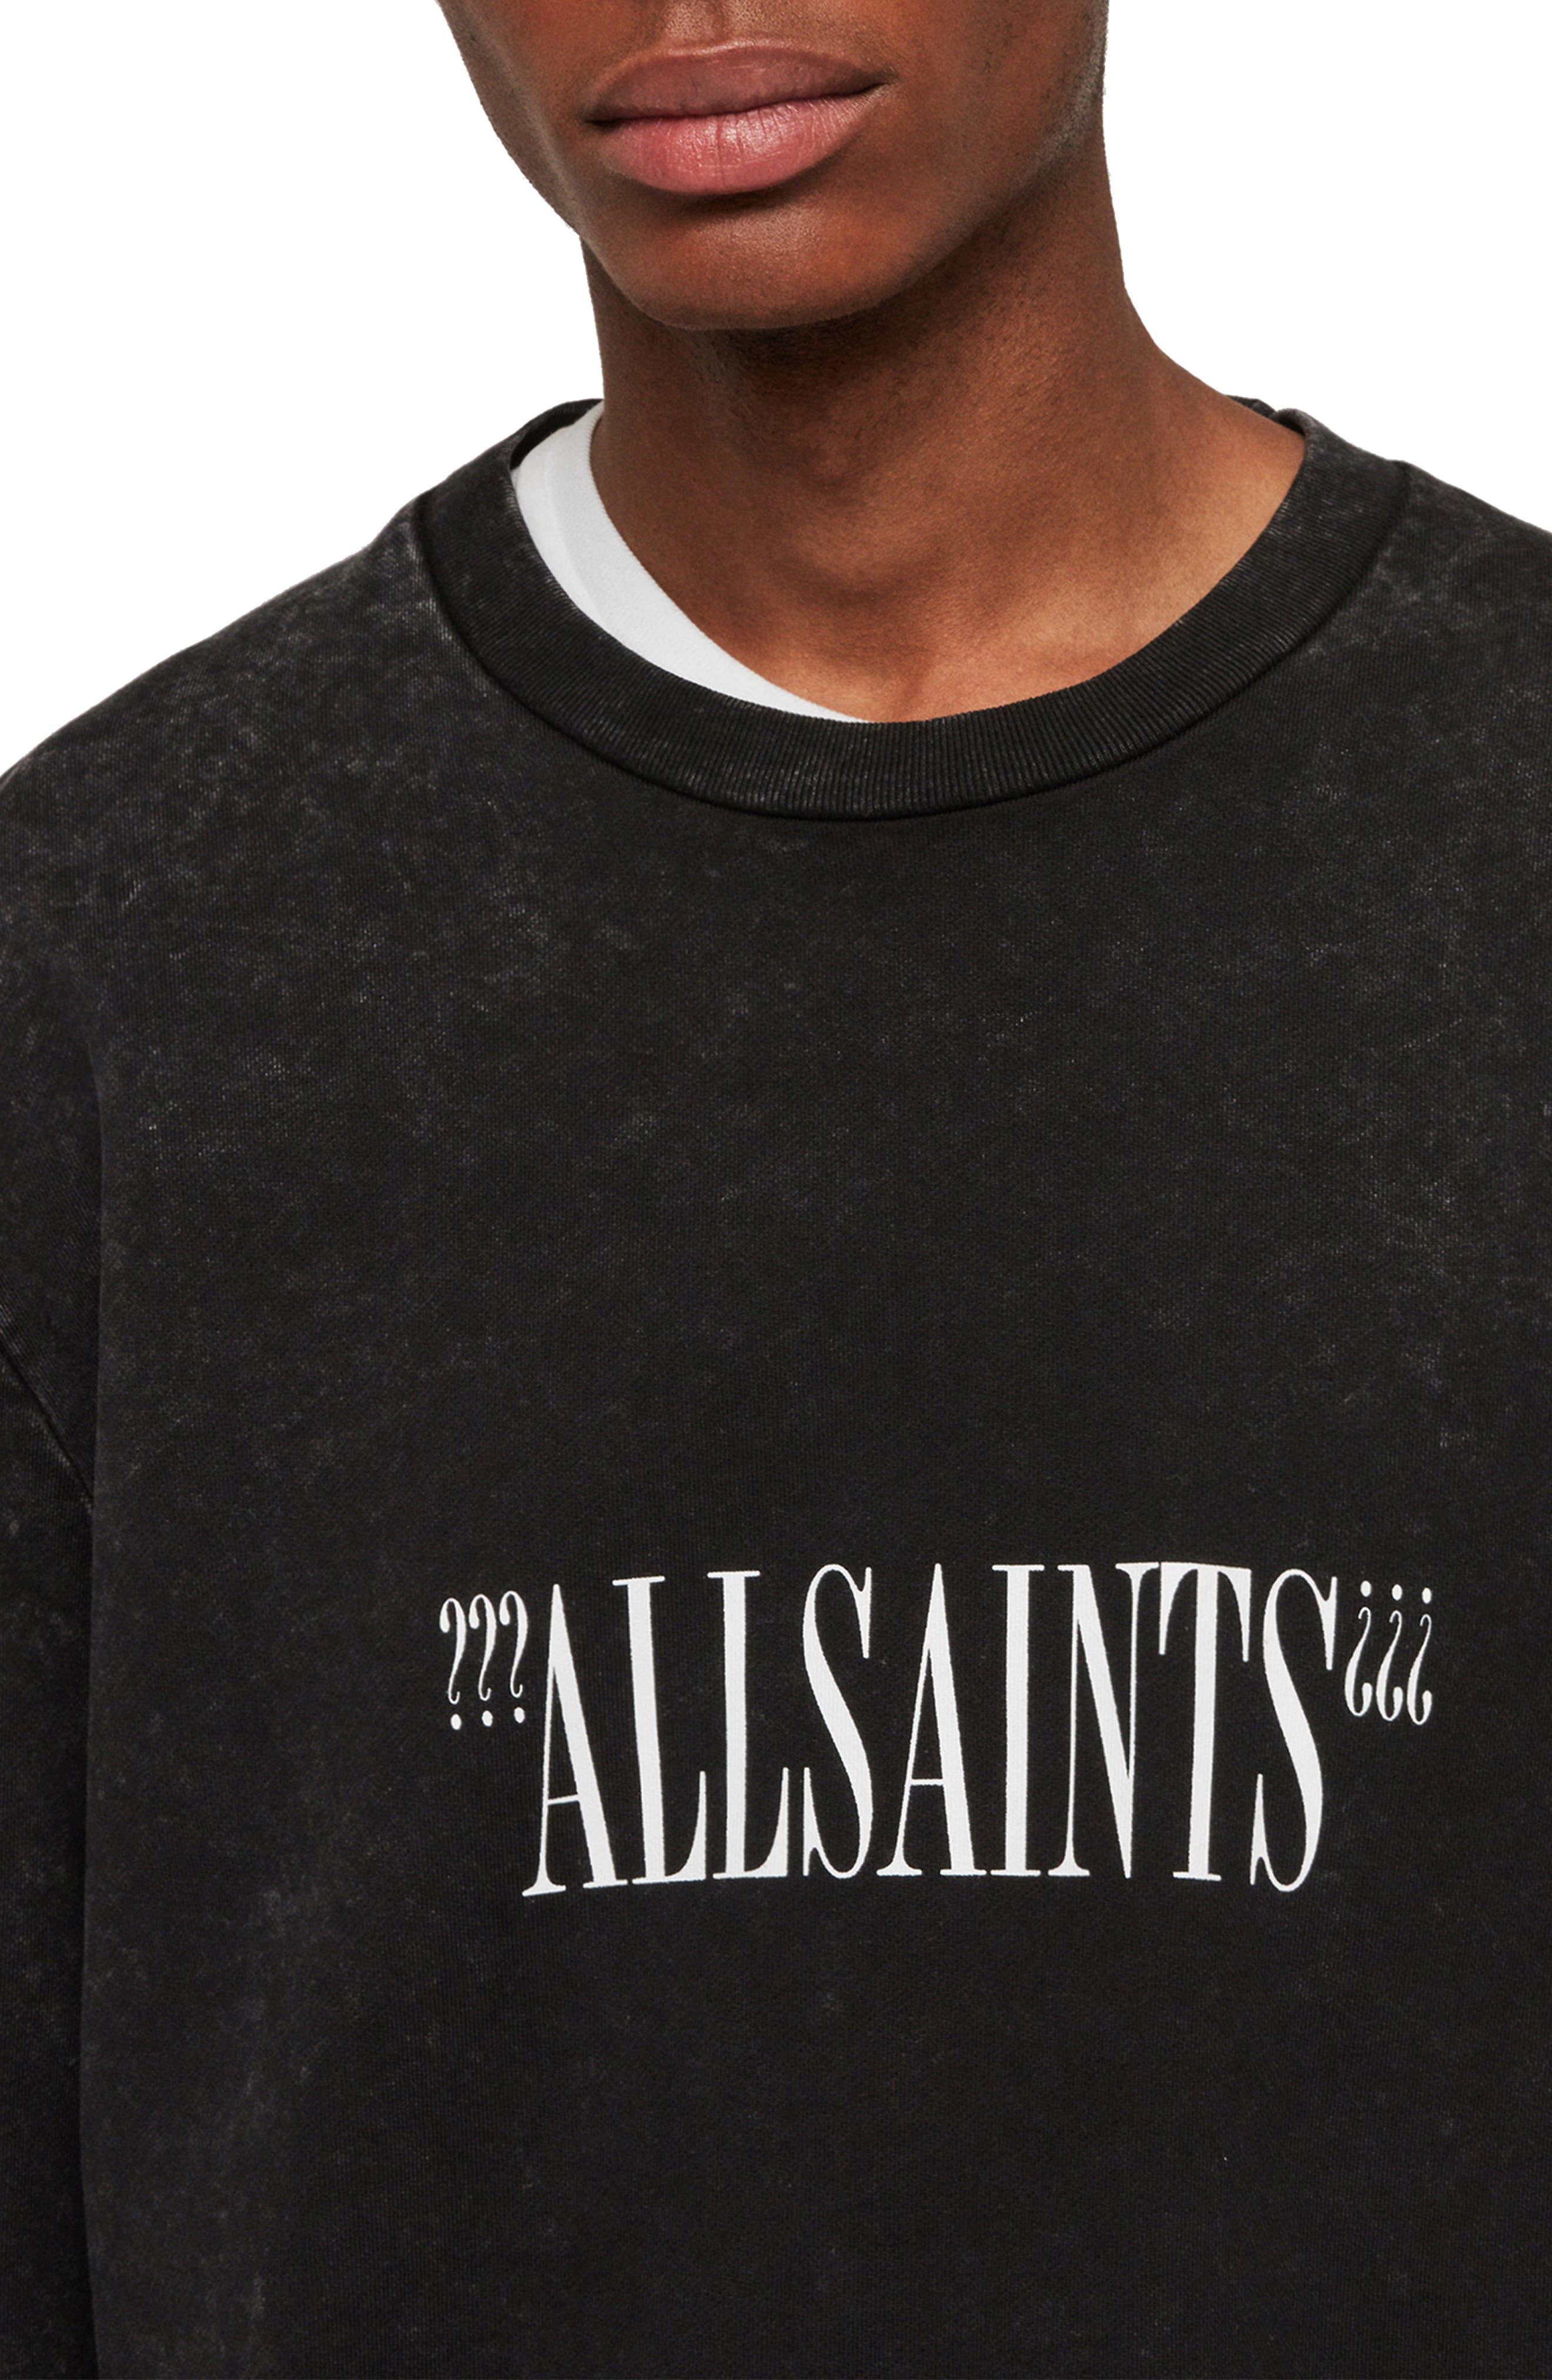 ALLSAINTS, Brackets Logo Graphic Fleece Sweatshirt, Alternate thumbnail 3, color, ACID WASHED BLACK